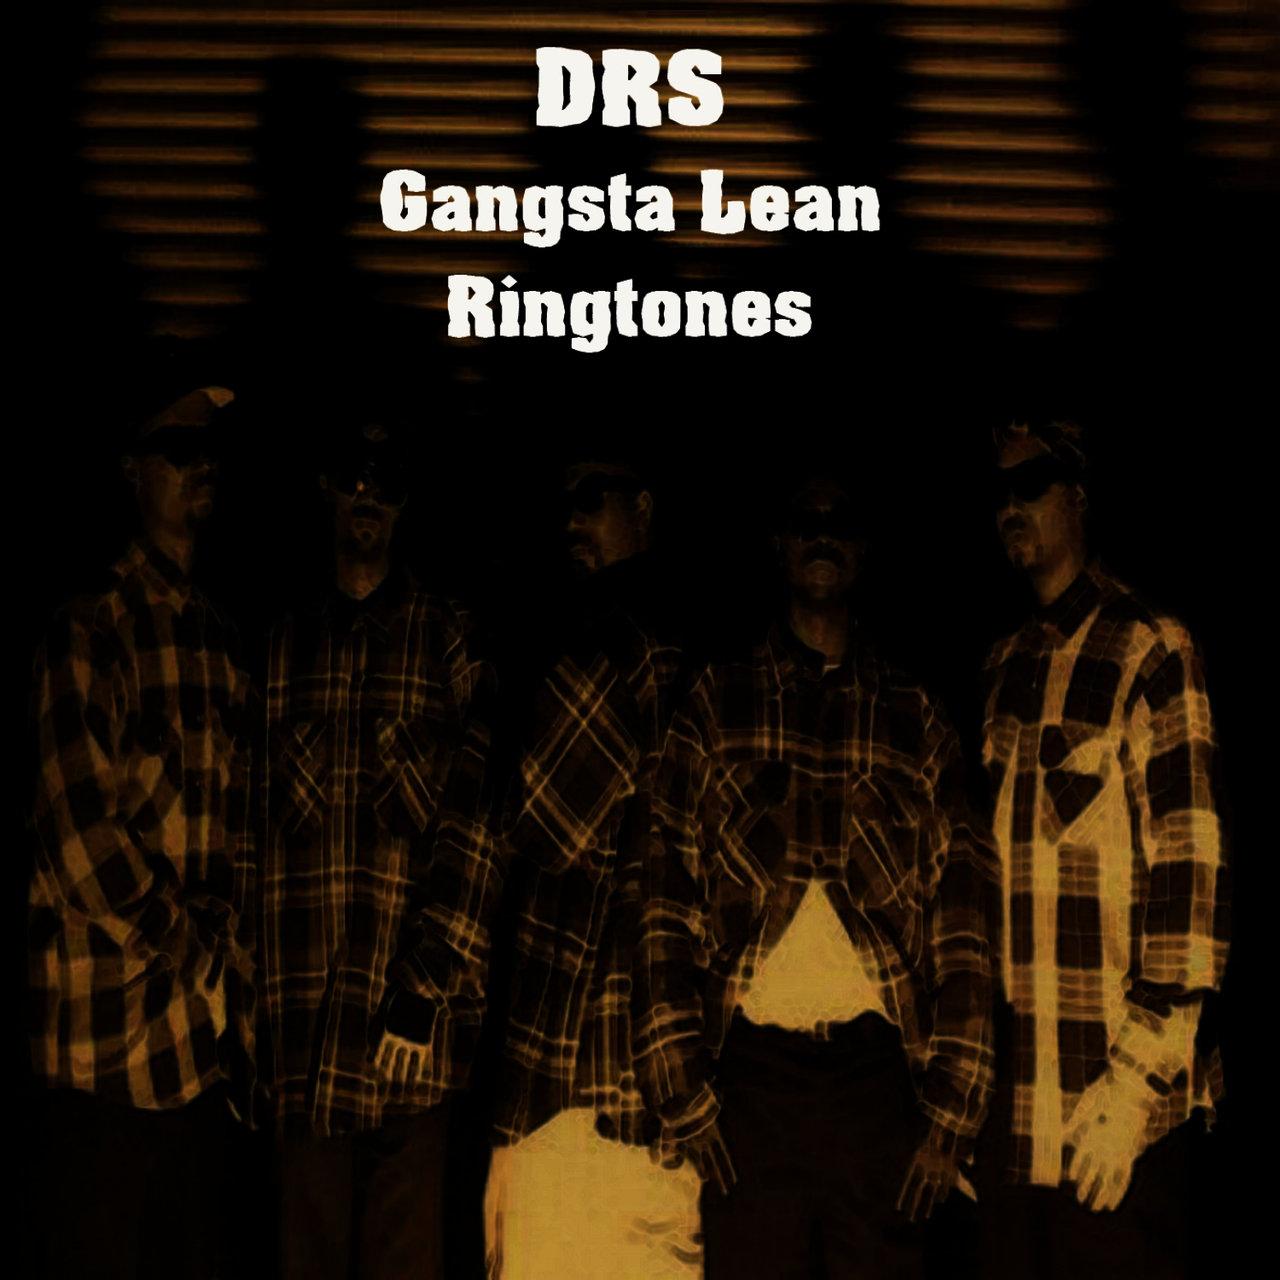 Drs – gangsta lean (gangstapella) lyrics | genius lyrics.